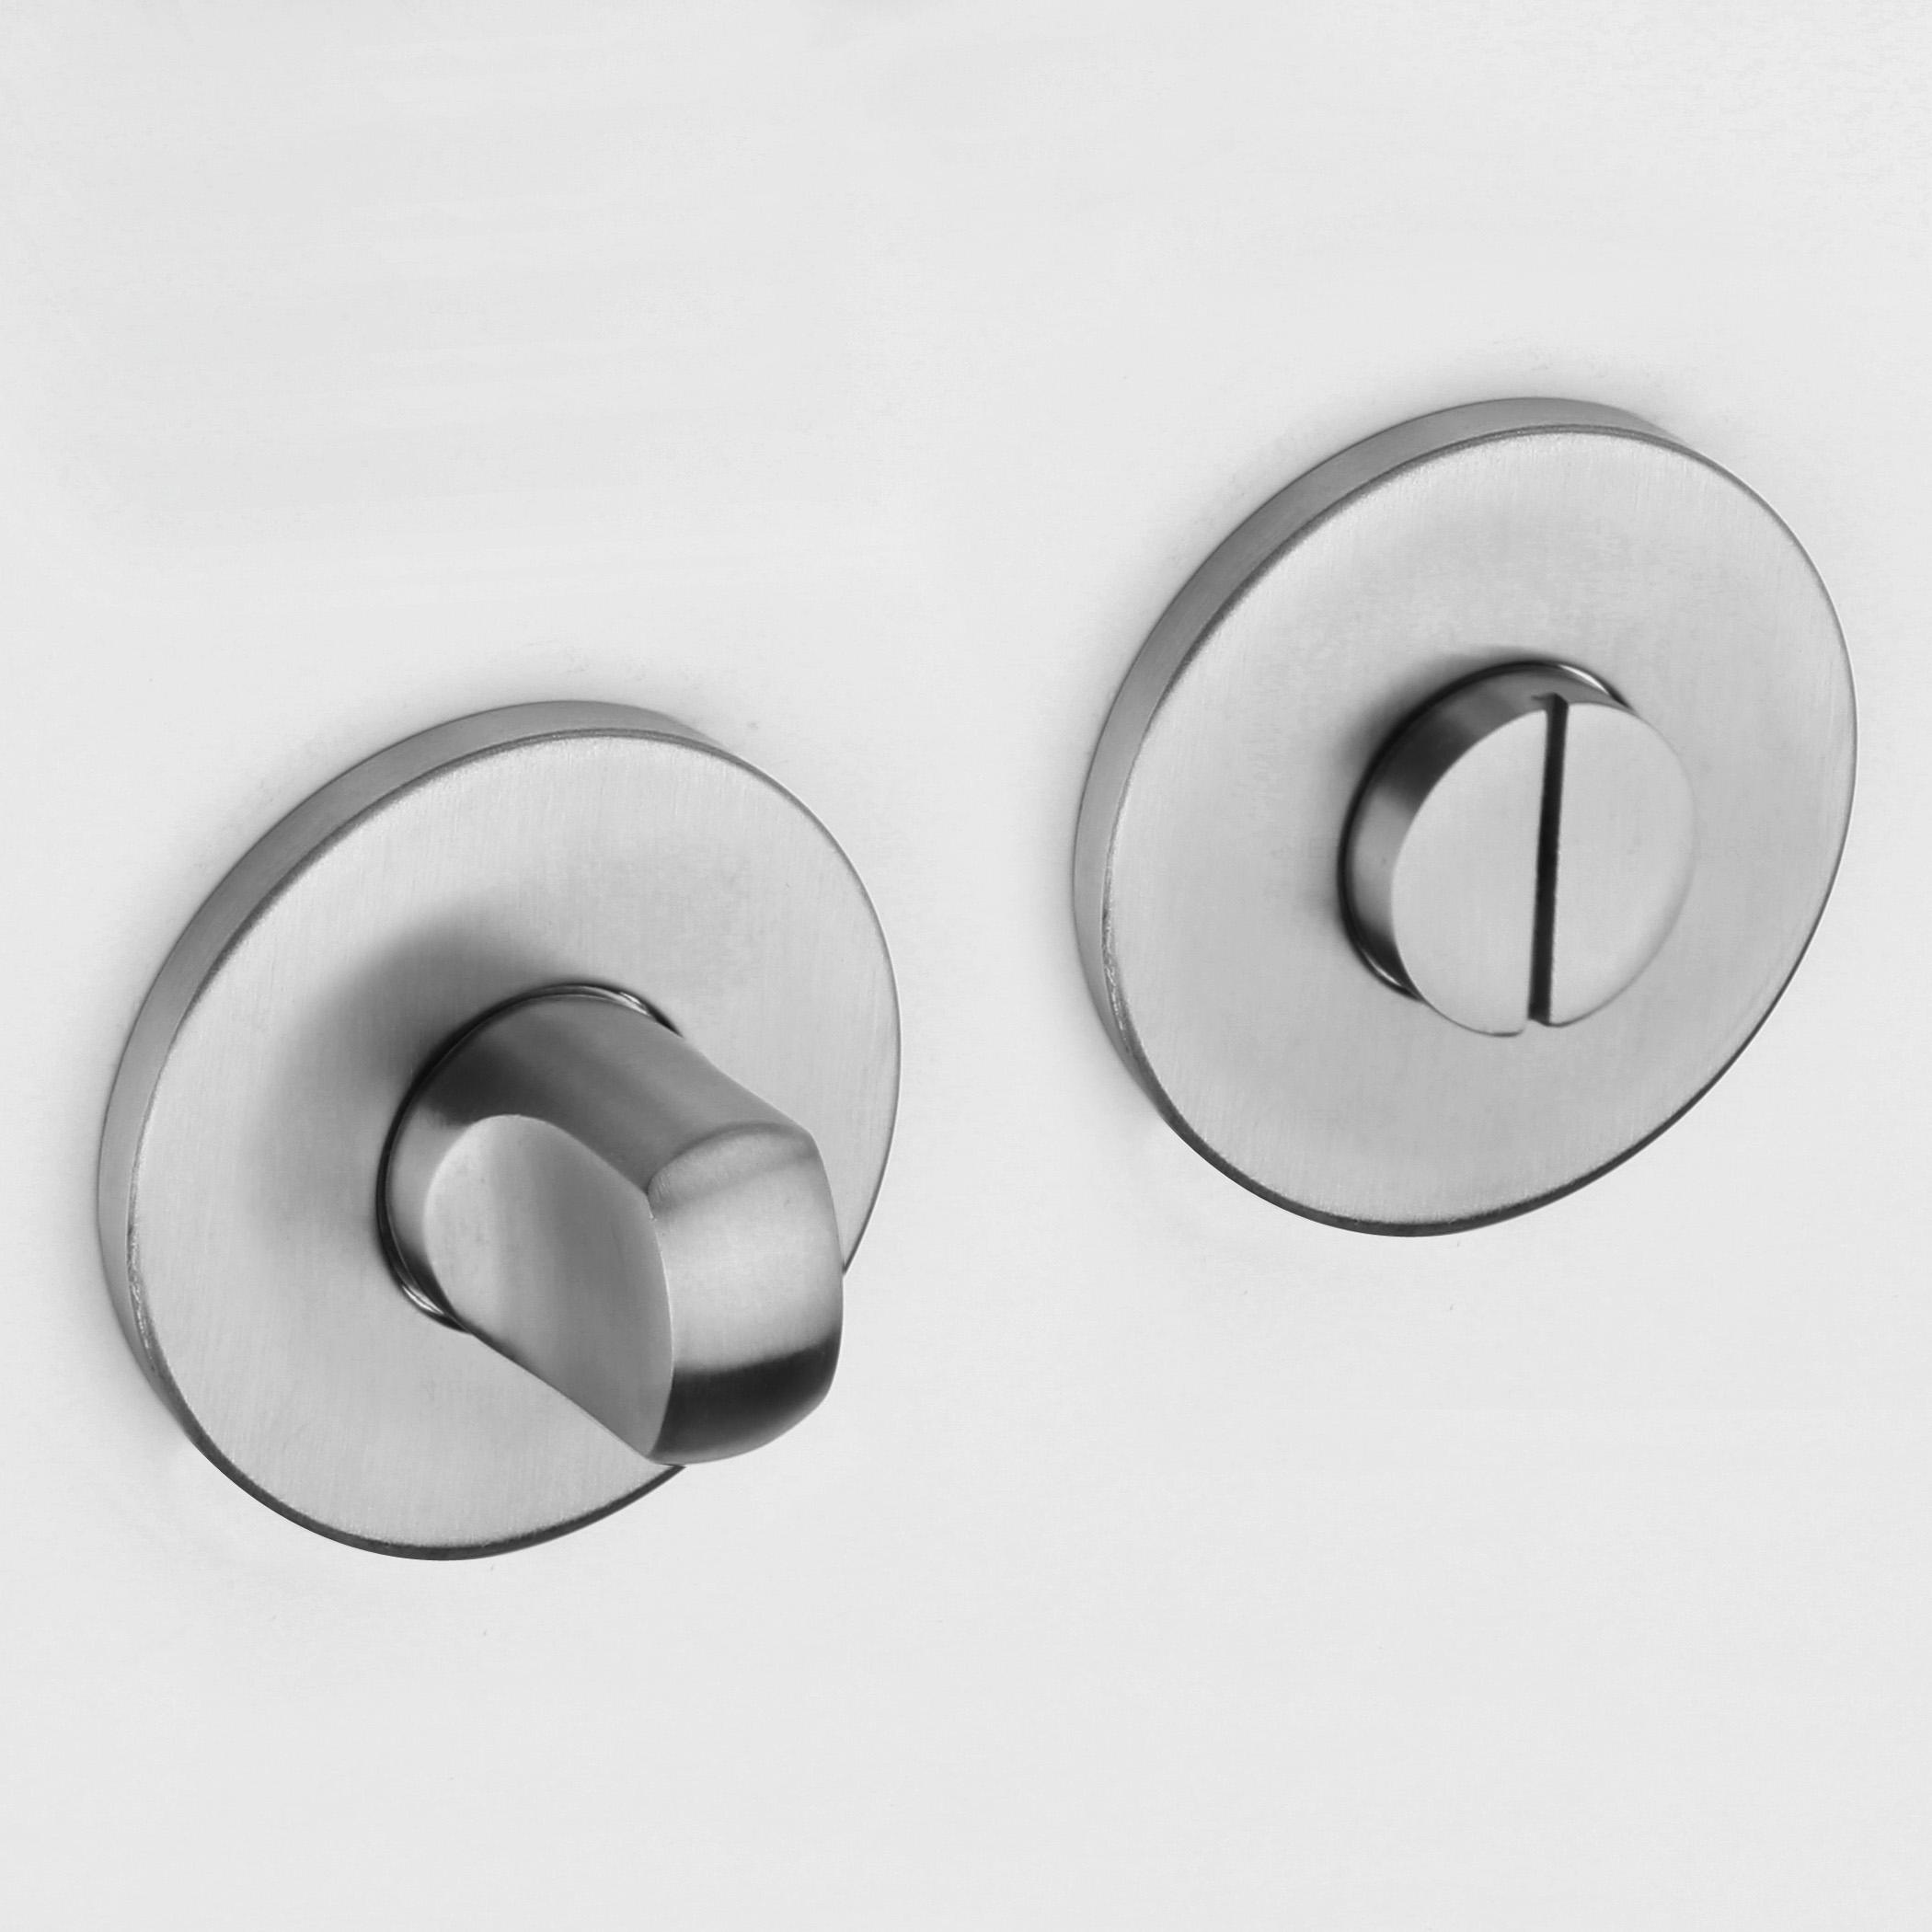 wc bad verschluss schloss verriegelung toilette t r drehknopf t rgriff edelstahl 740999294577 ebay. Black Bedroom Furniture Sets. Home Design Ideas